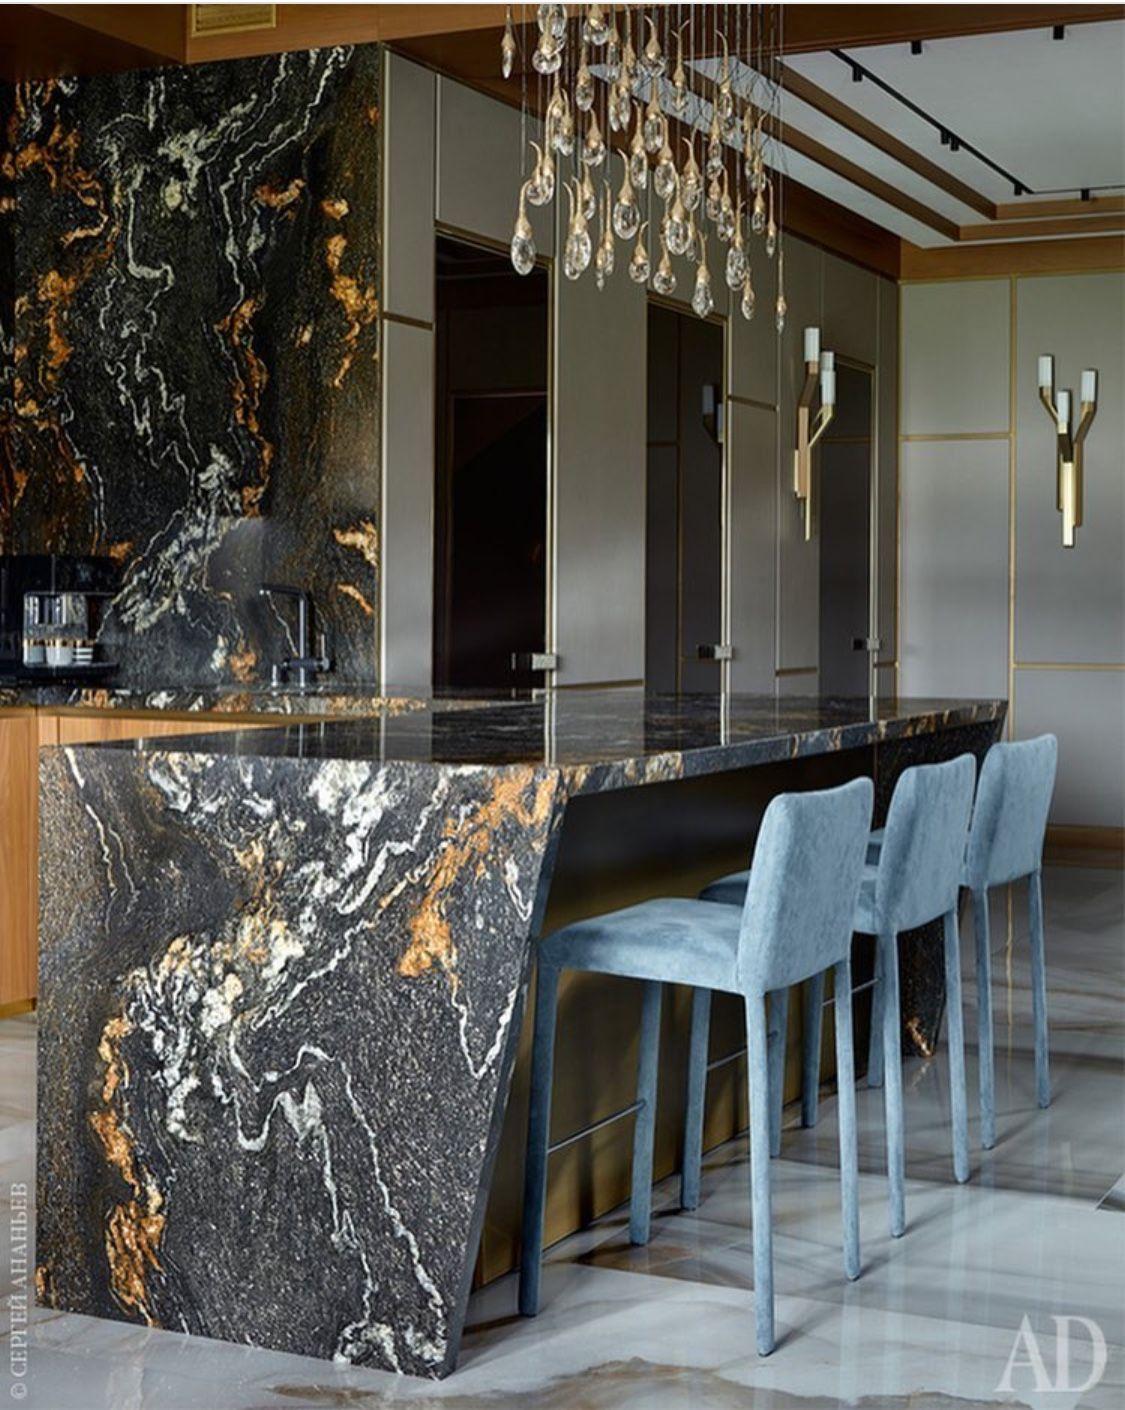 Küchendesign marmor pin by jennifergrayart on adroit design  in   pinterest